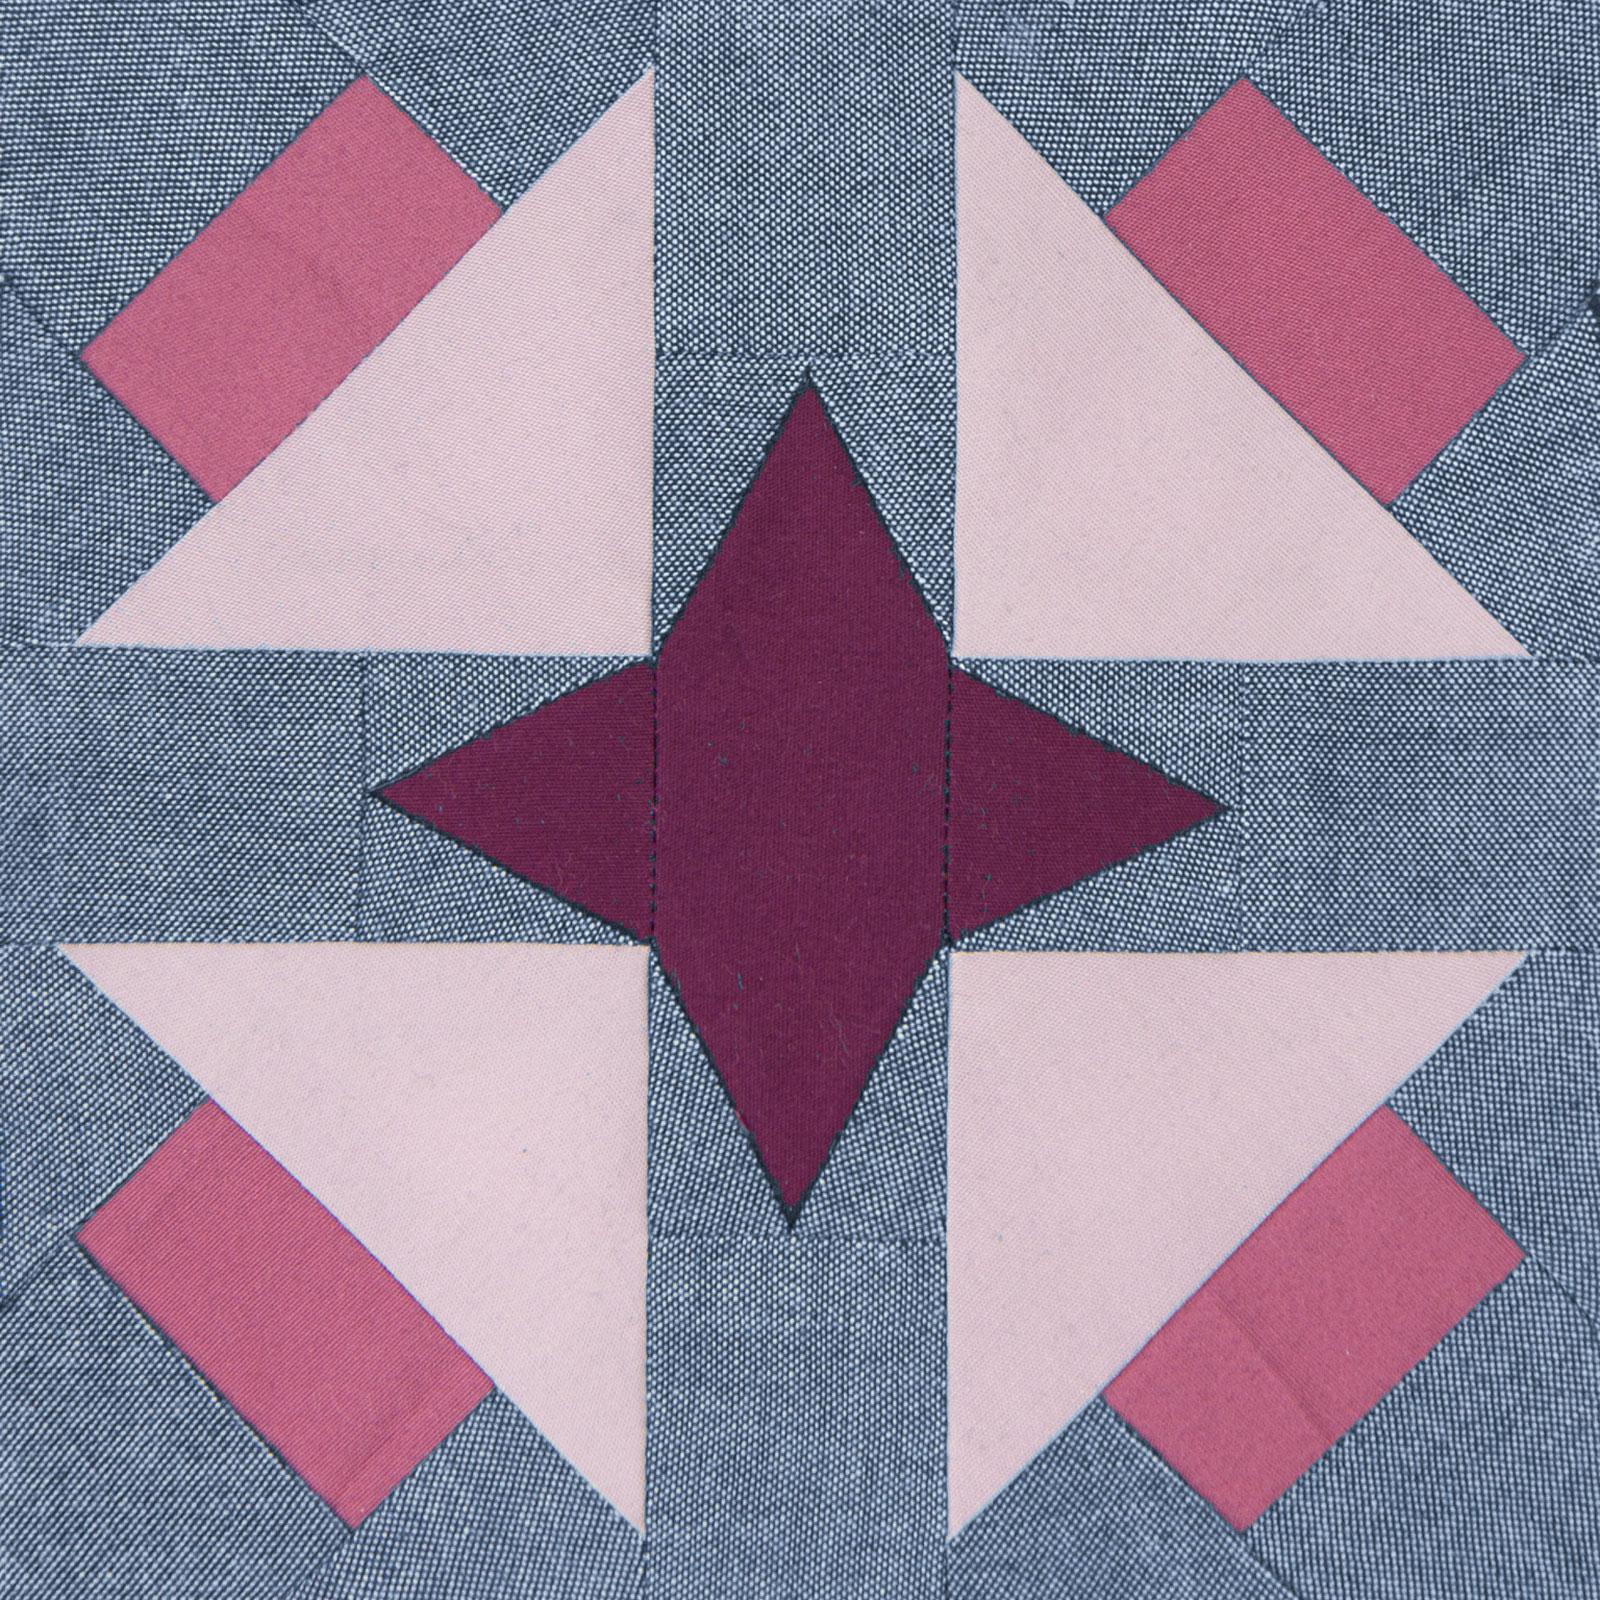 Lodestars quilt block #18: Sarah